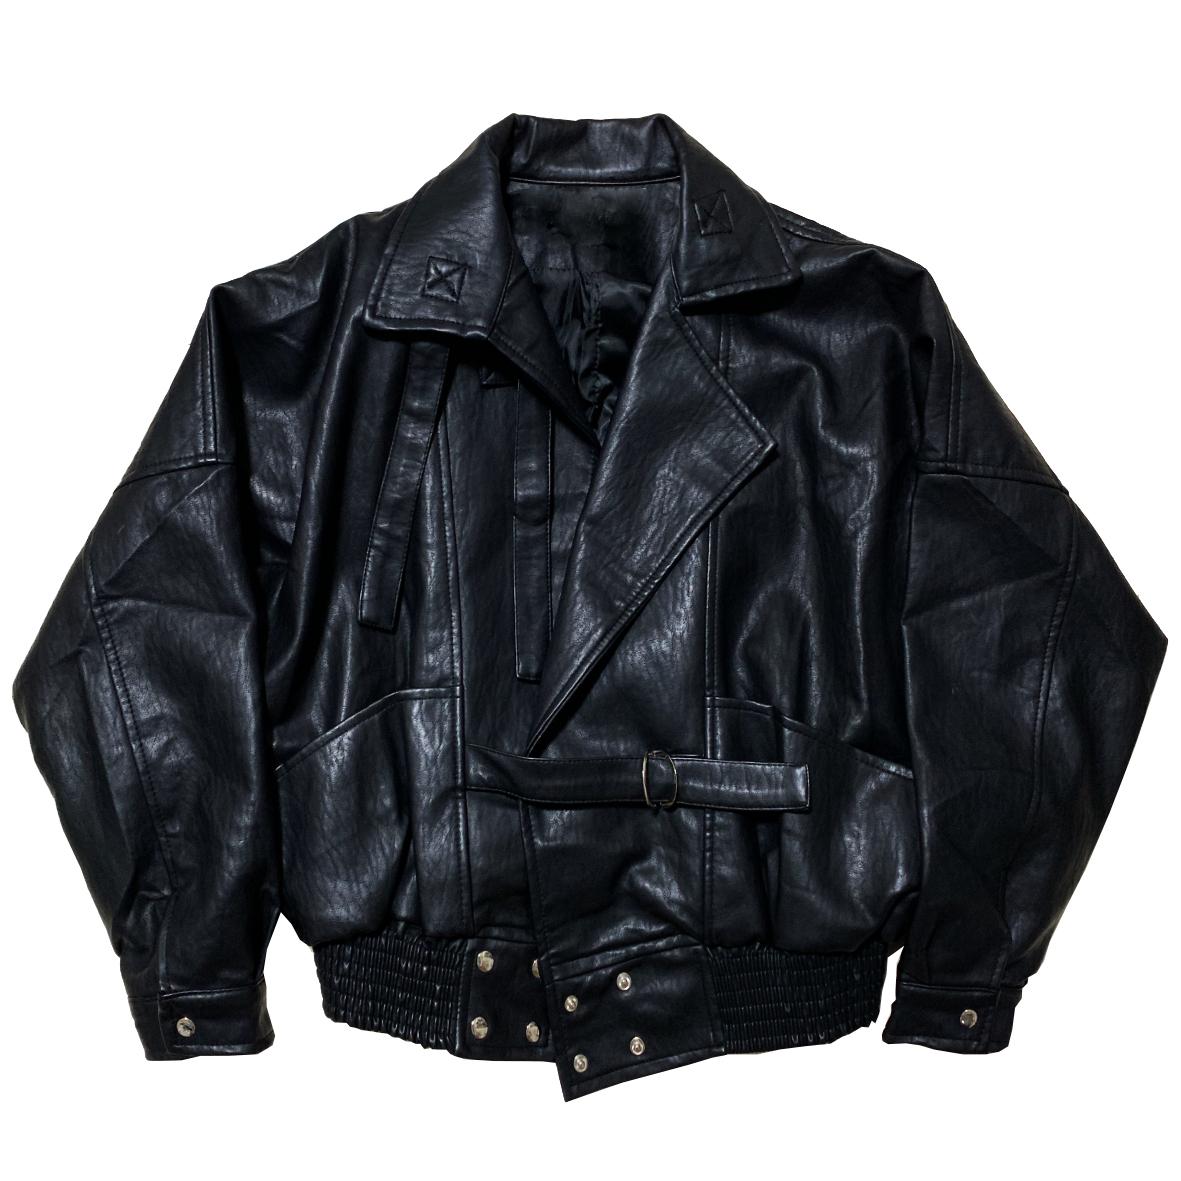 Oversize Biker Leather Jacket